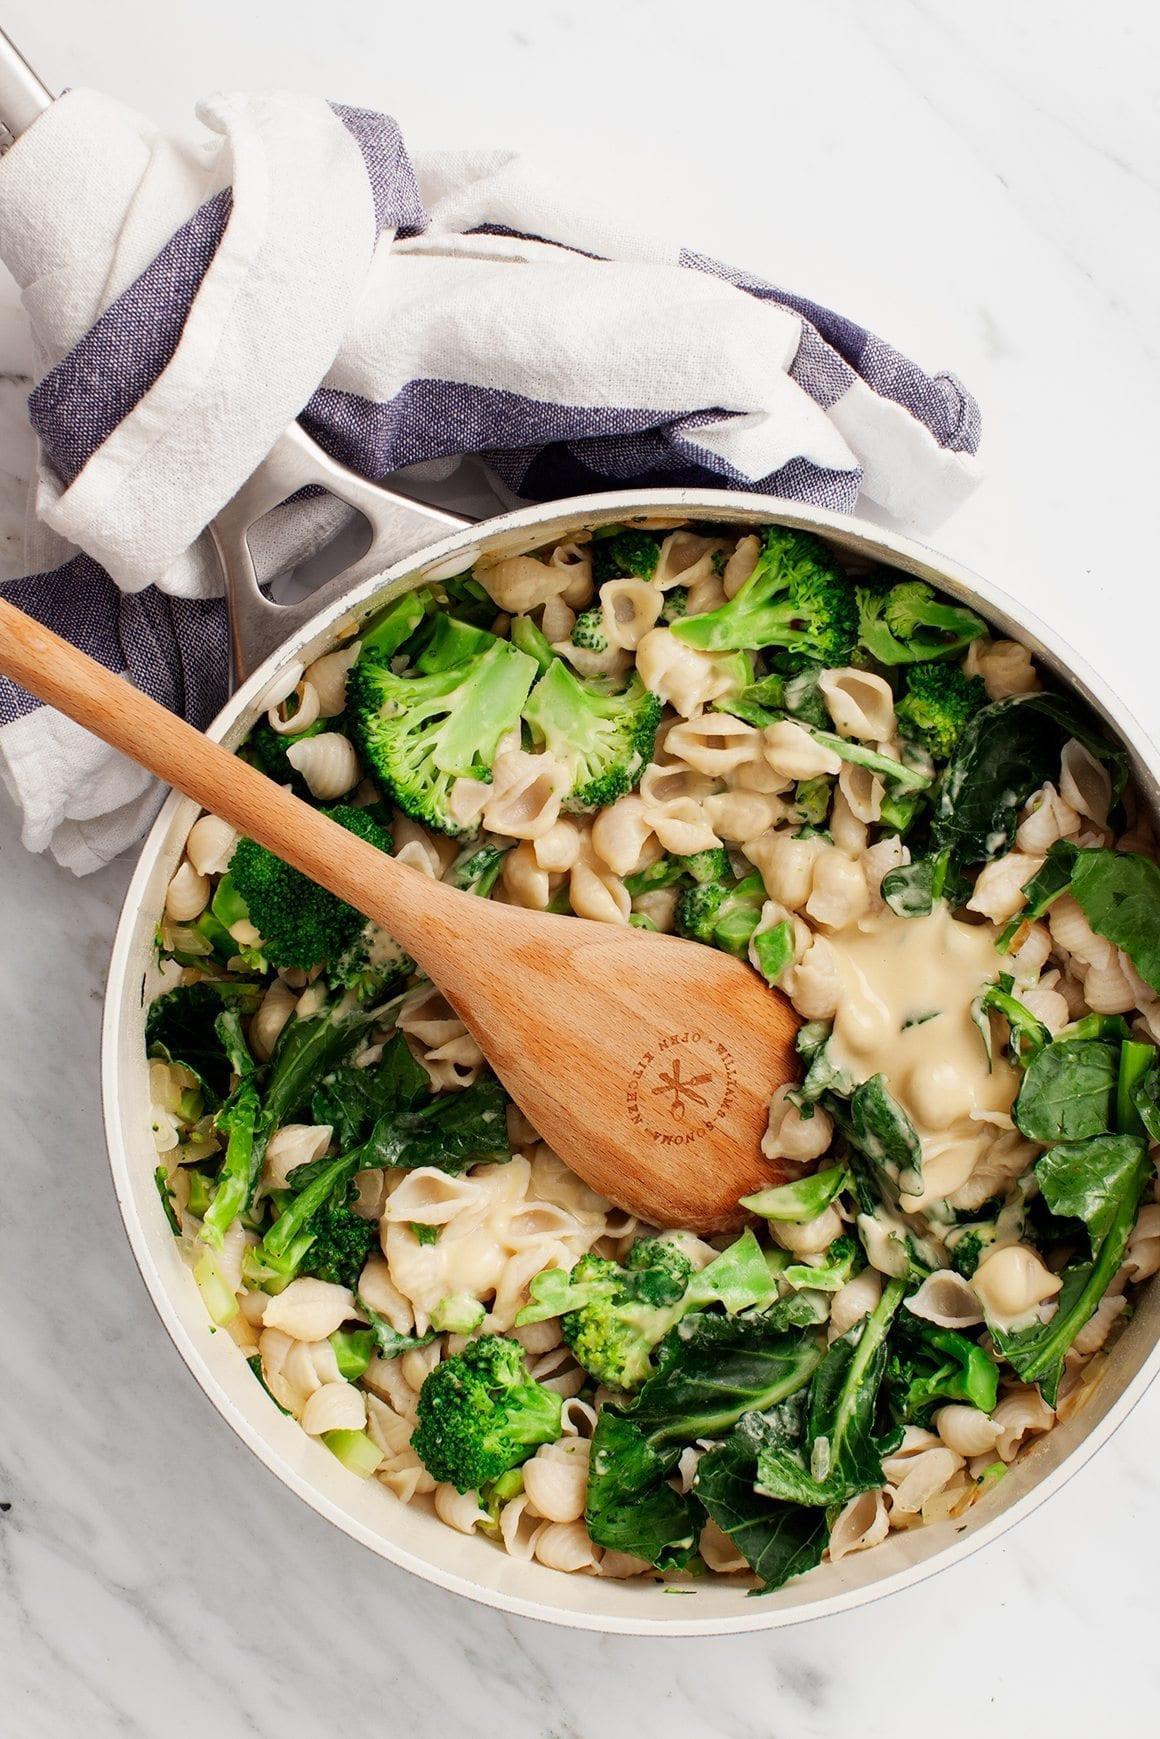 Vegetarian Healthy Dinners  Healthy Ve arian Dinner Recipes Love and Lemons